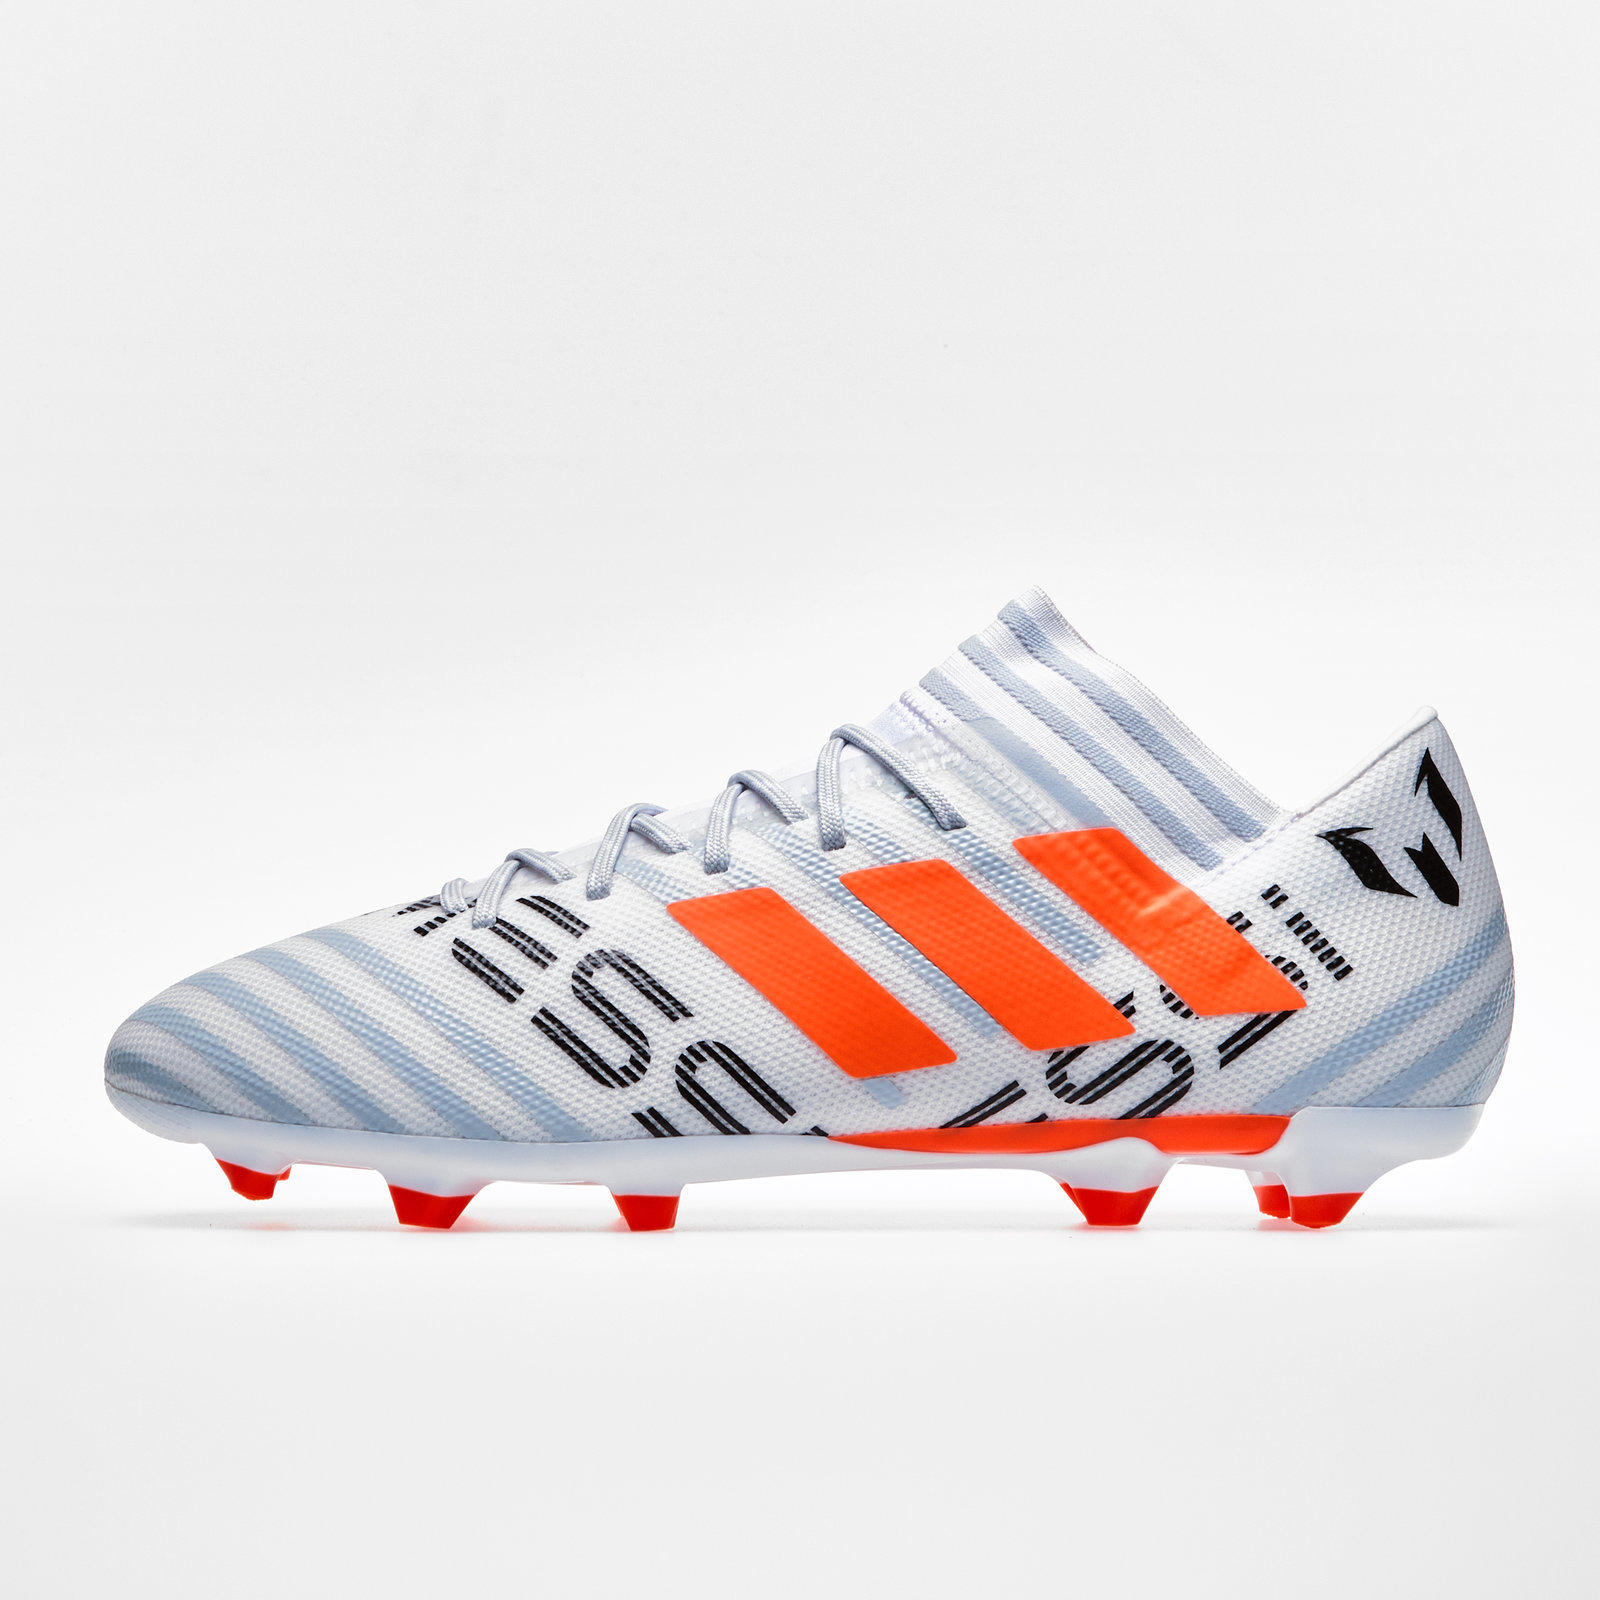 fdfb381e7168 adidas Nemeziz Messi 17.3 FG Football Boots Sport Shoes Footwear Bladed